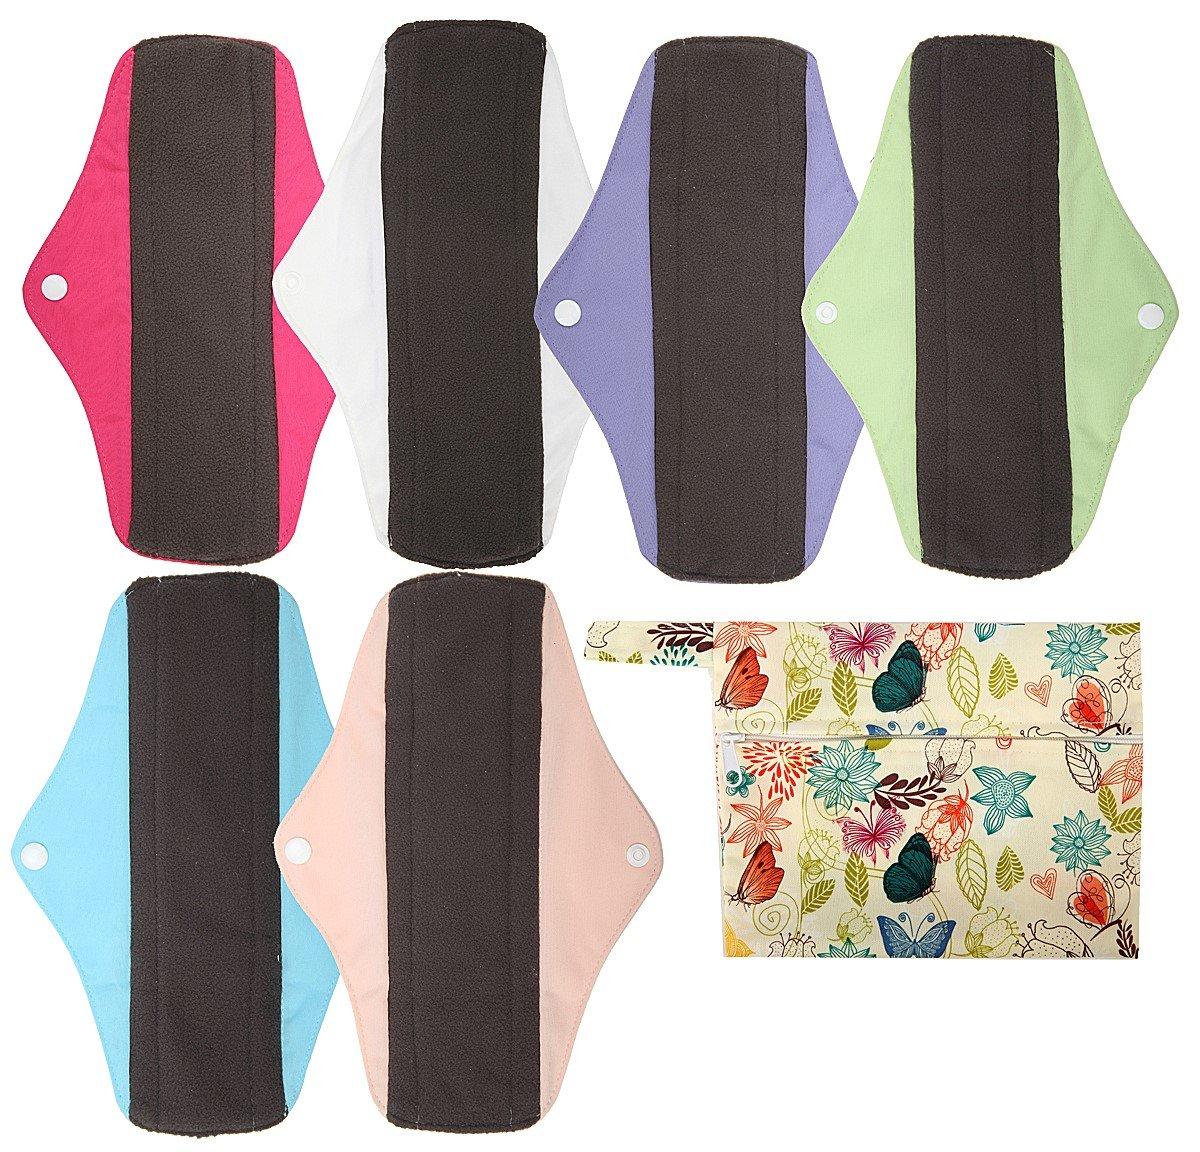 6pcs 10 Inch Regular Charcoal Bamboo Mama Cloth// Menstrual Pads// Reusable Sanitary Pads by Hibaby 7pcs Set 1pc Mini Wet Bag